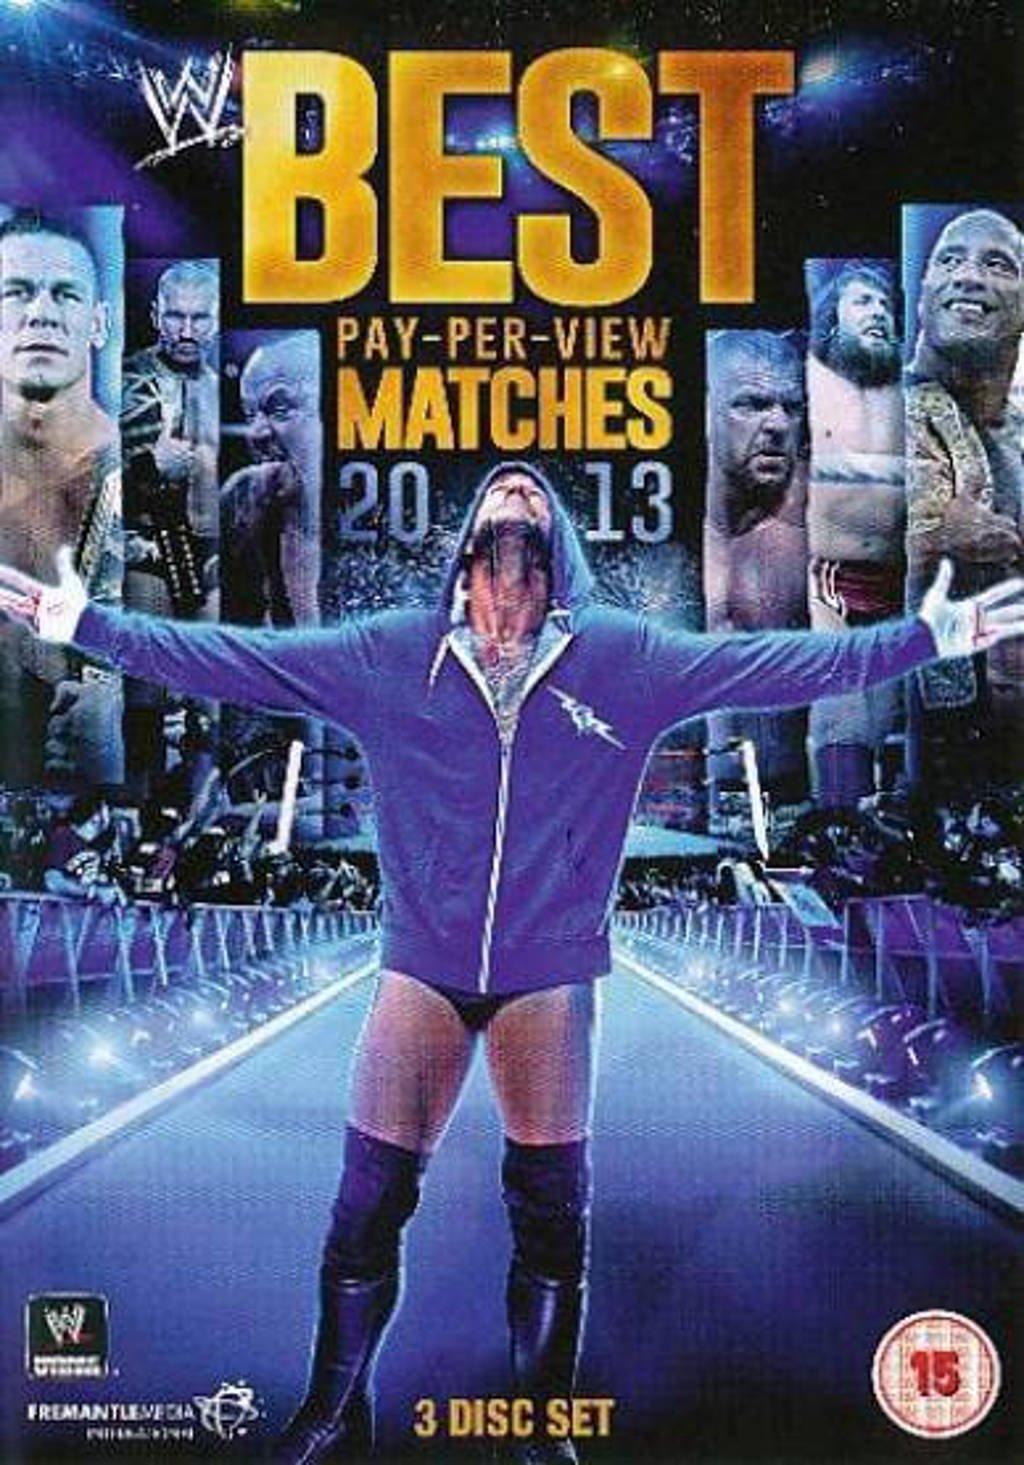 WWE - Best Ppv Matches 2013 (DVD)